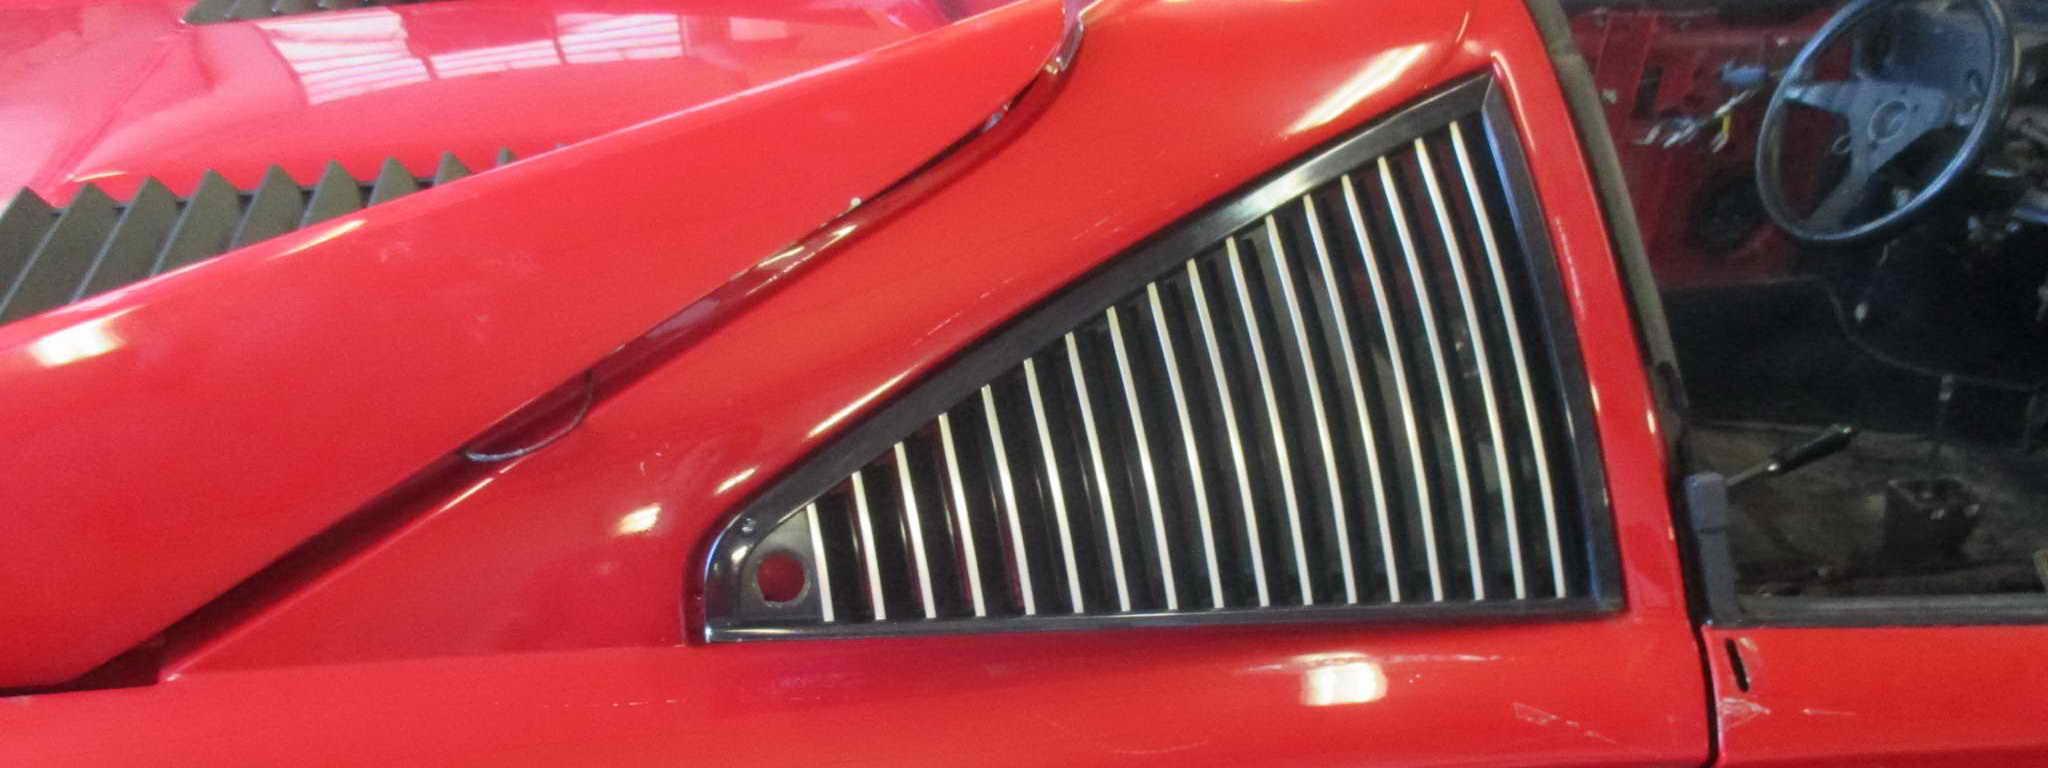 Ferrari 308 restoration banner